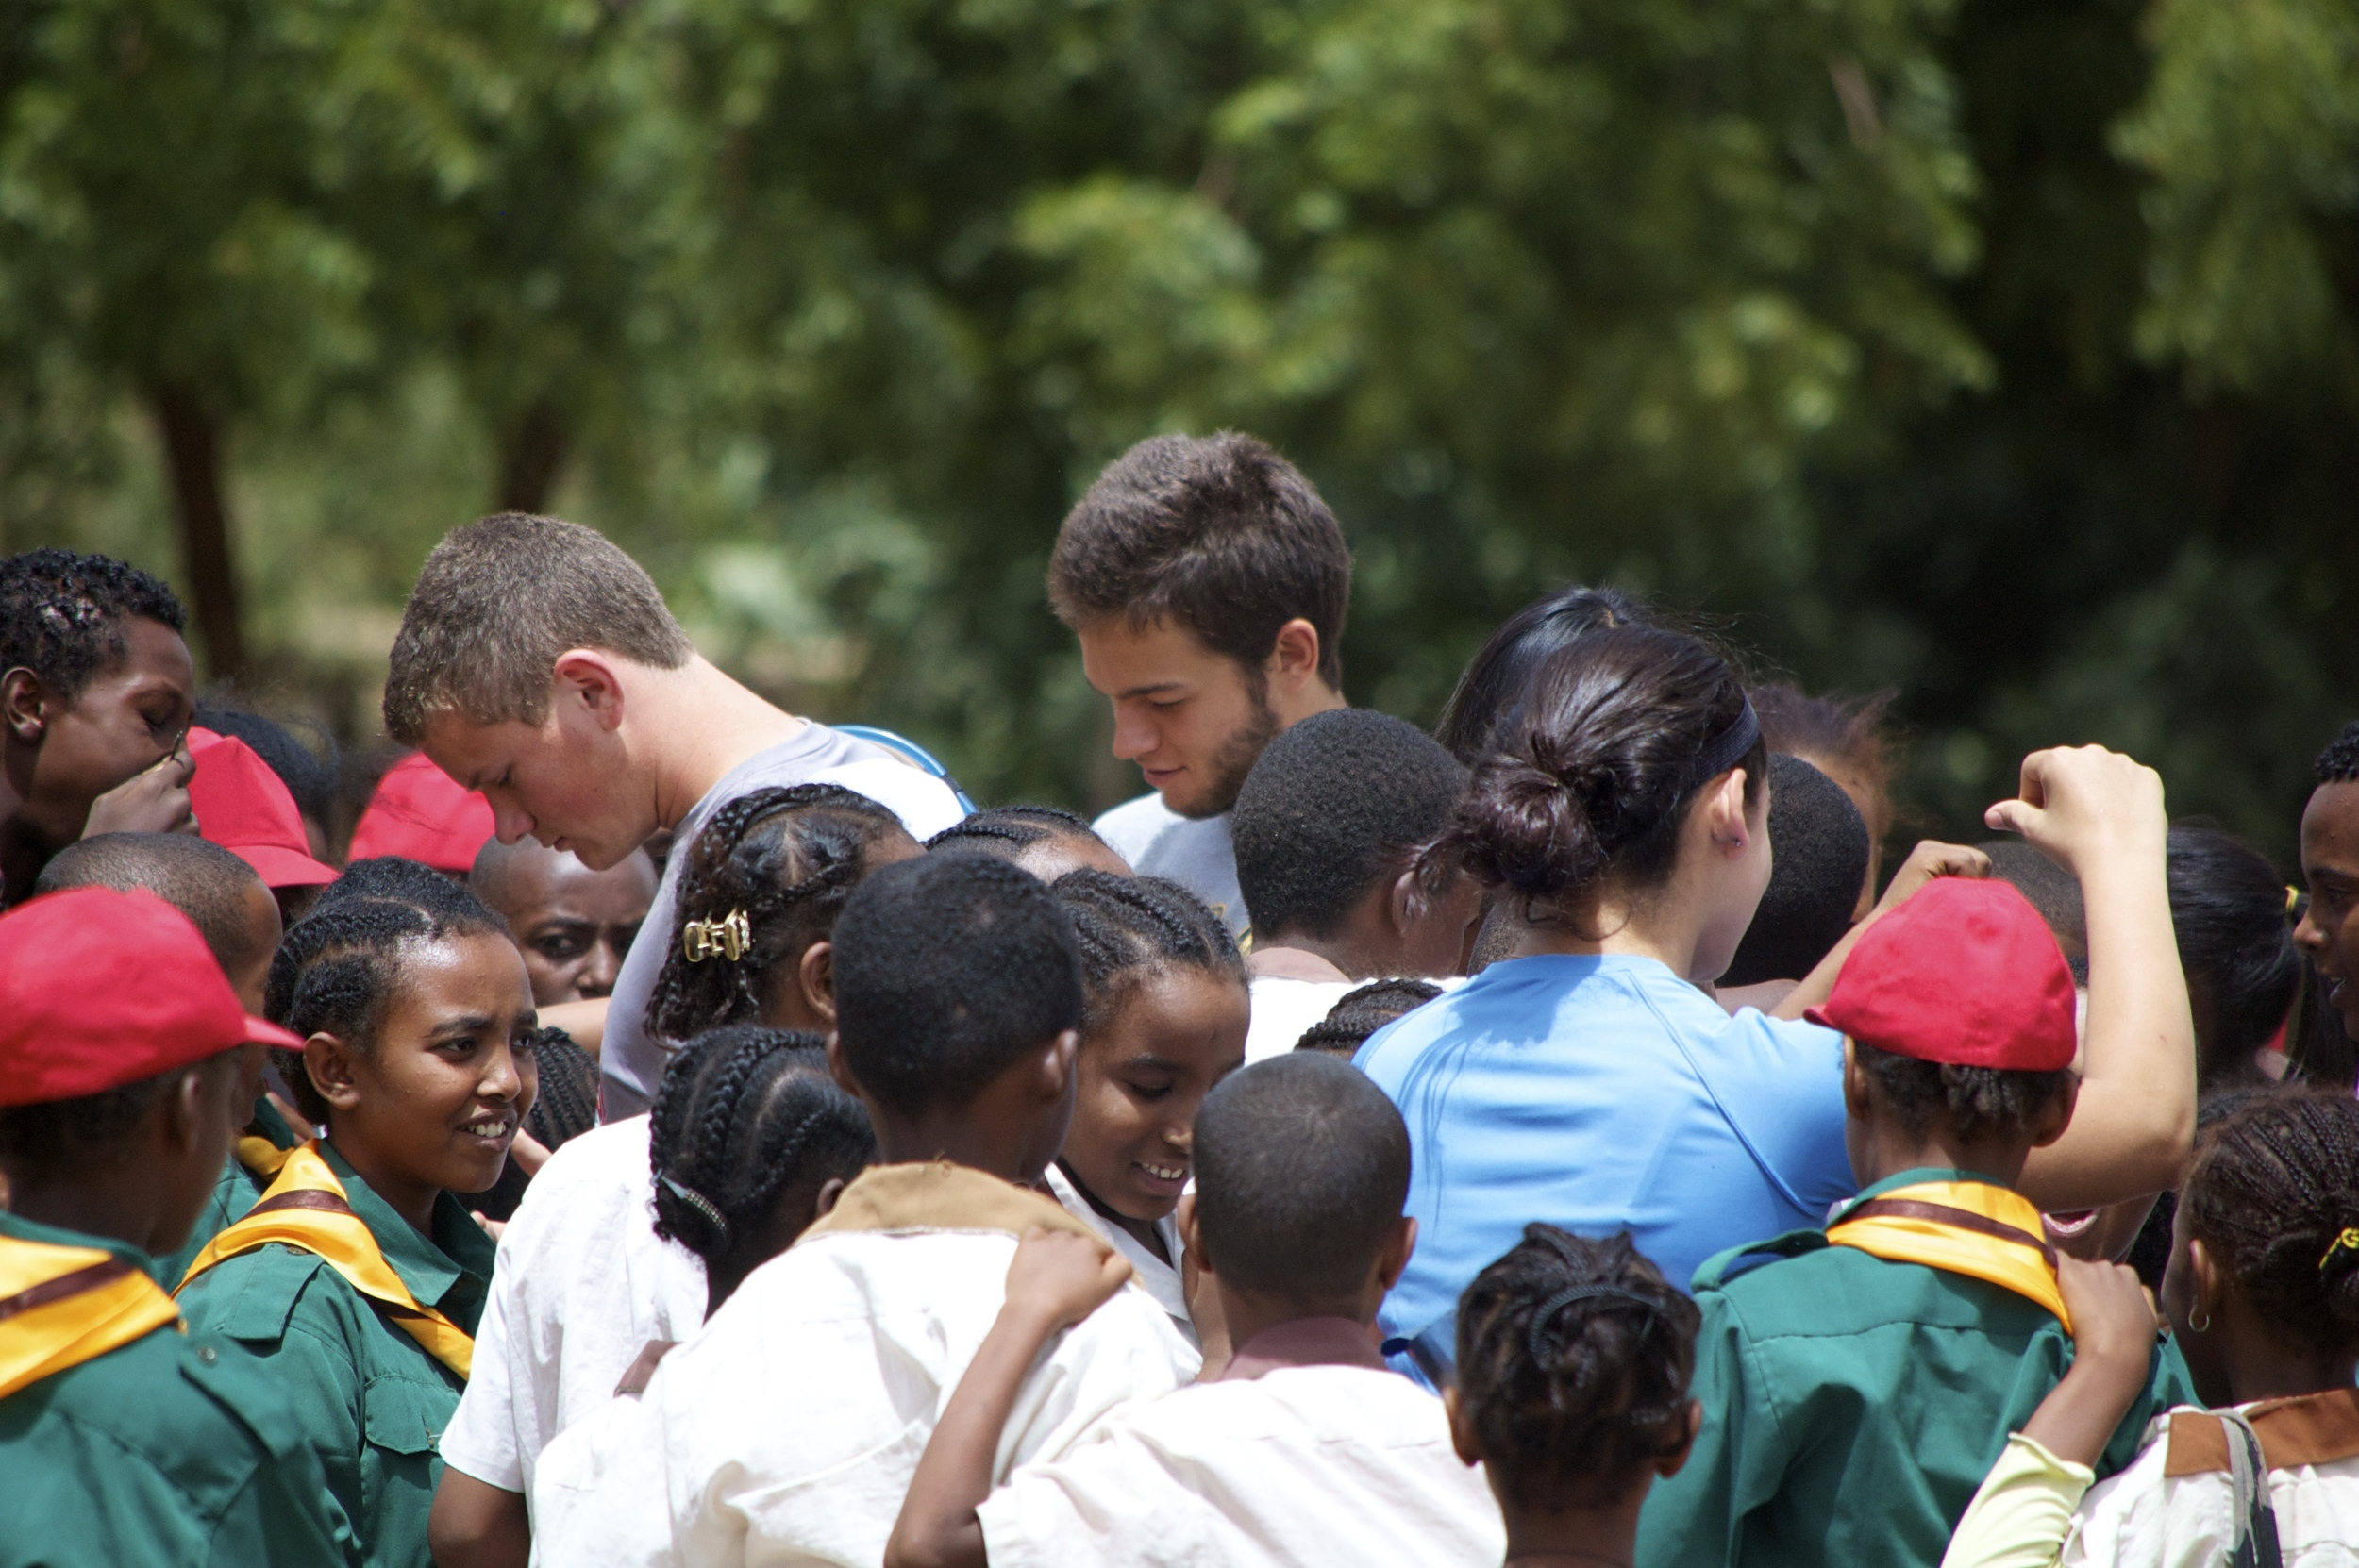 Matt and Sam talking with the school children